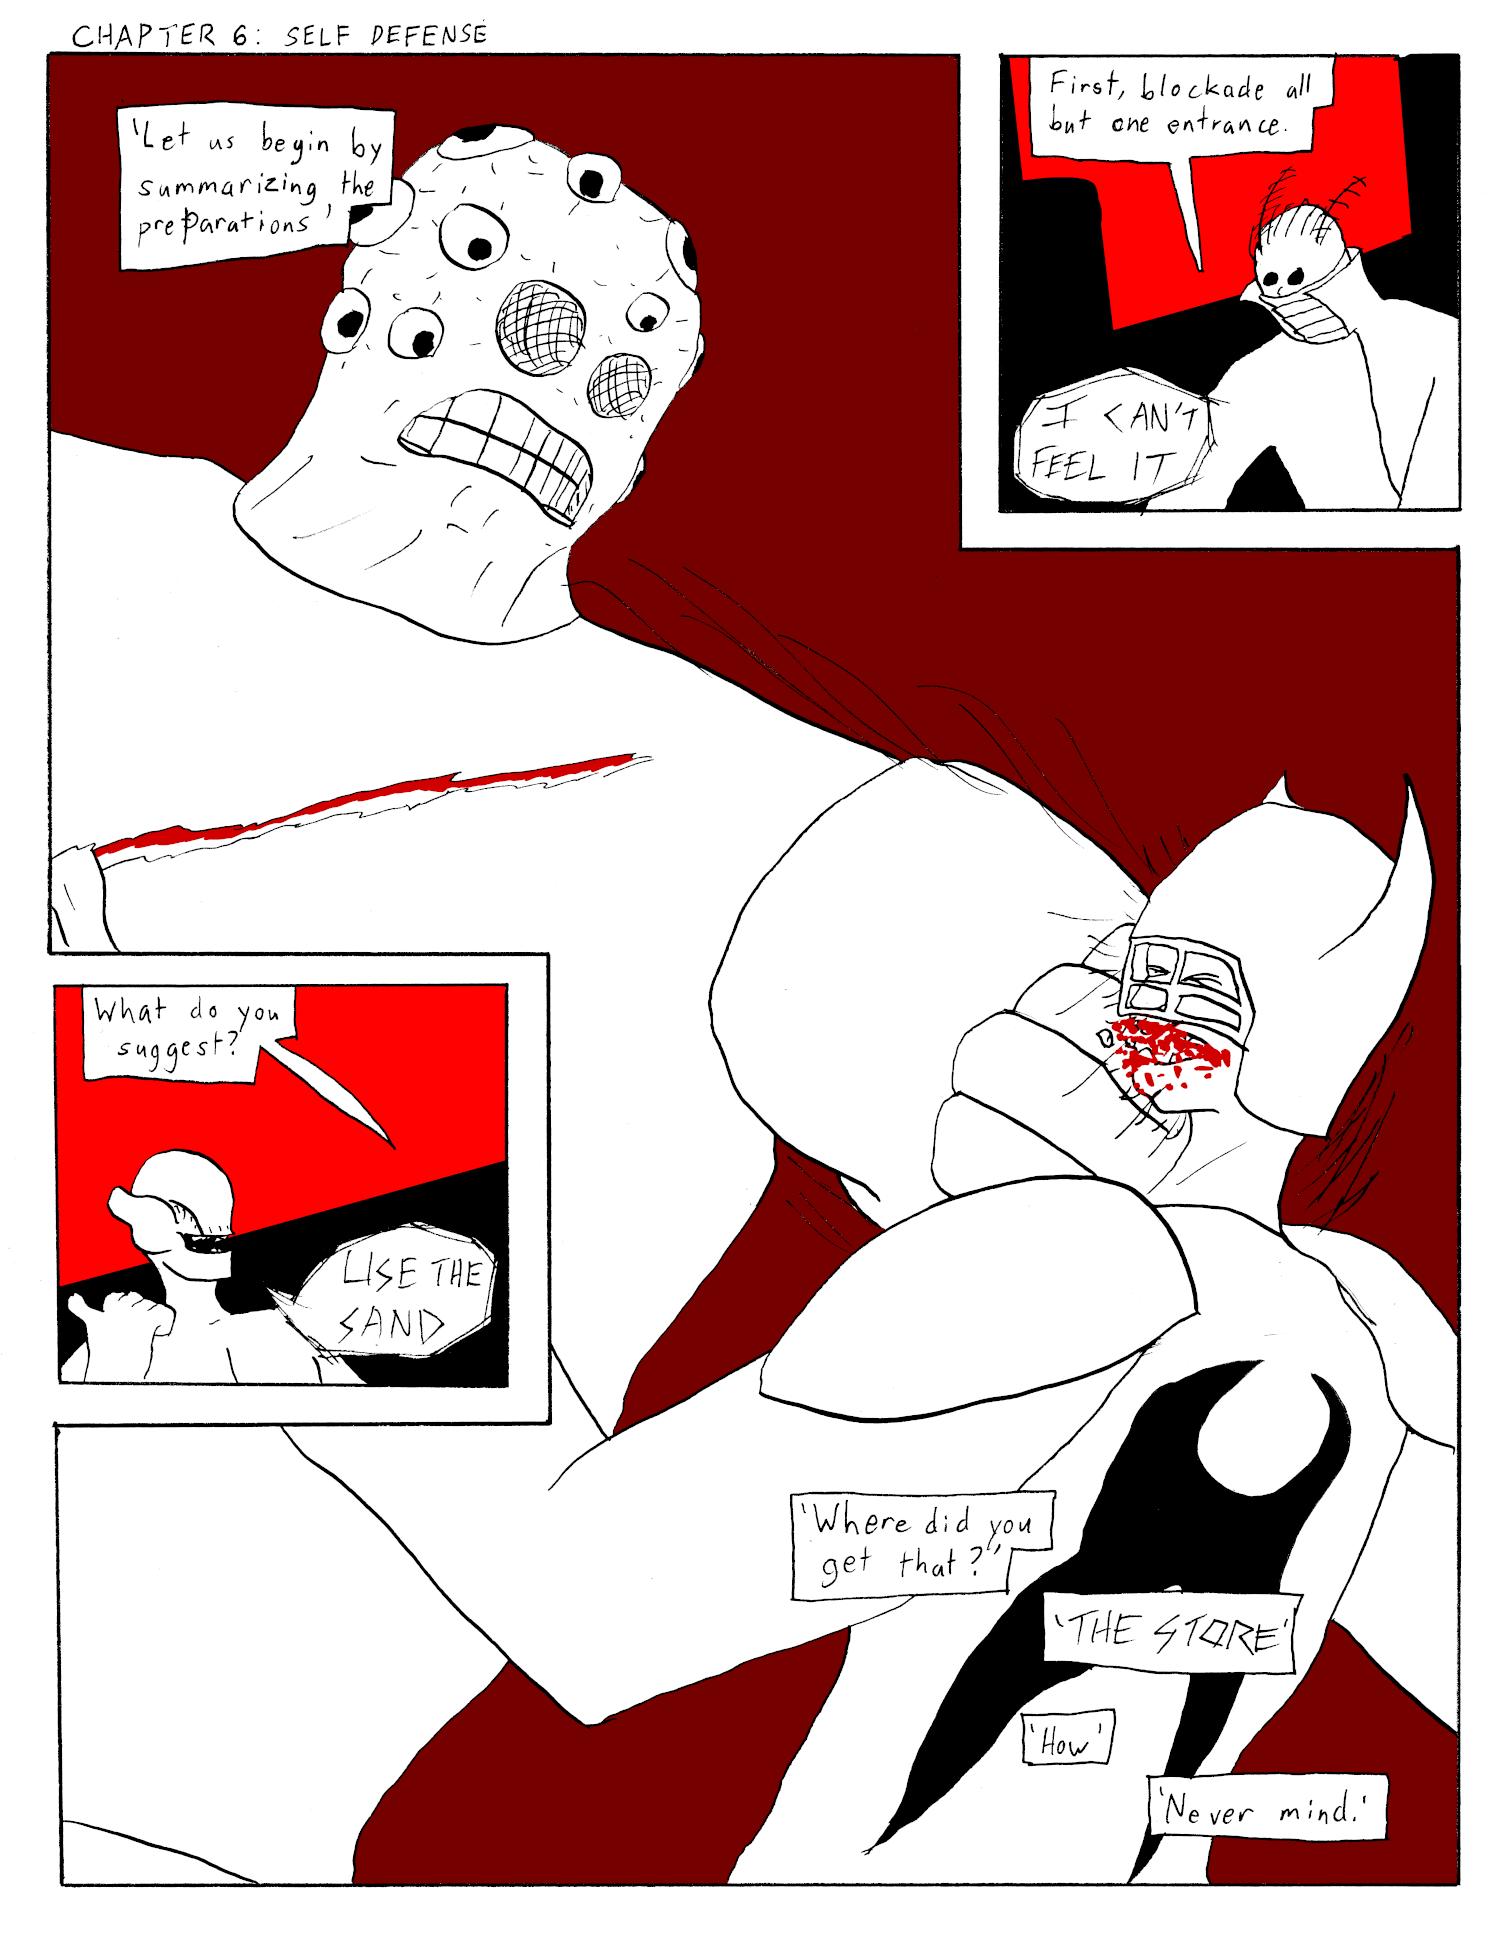 Chapter 6: Self Defense